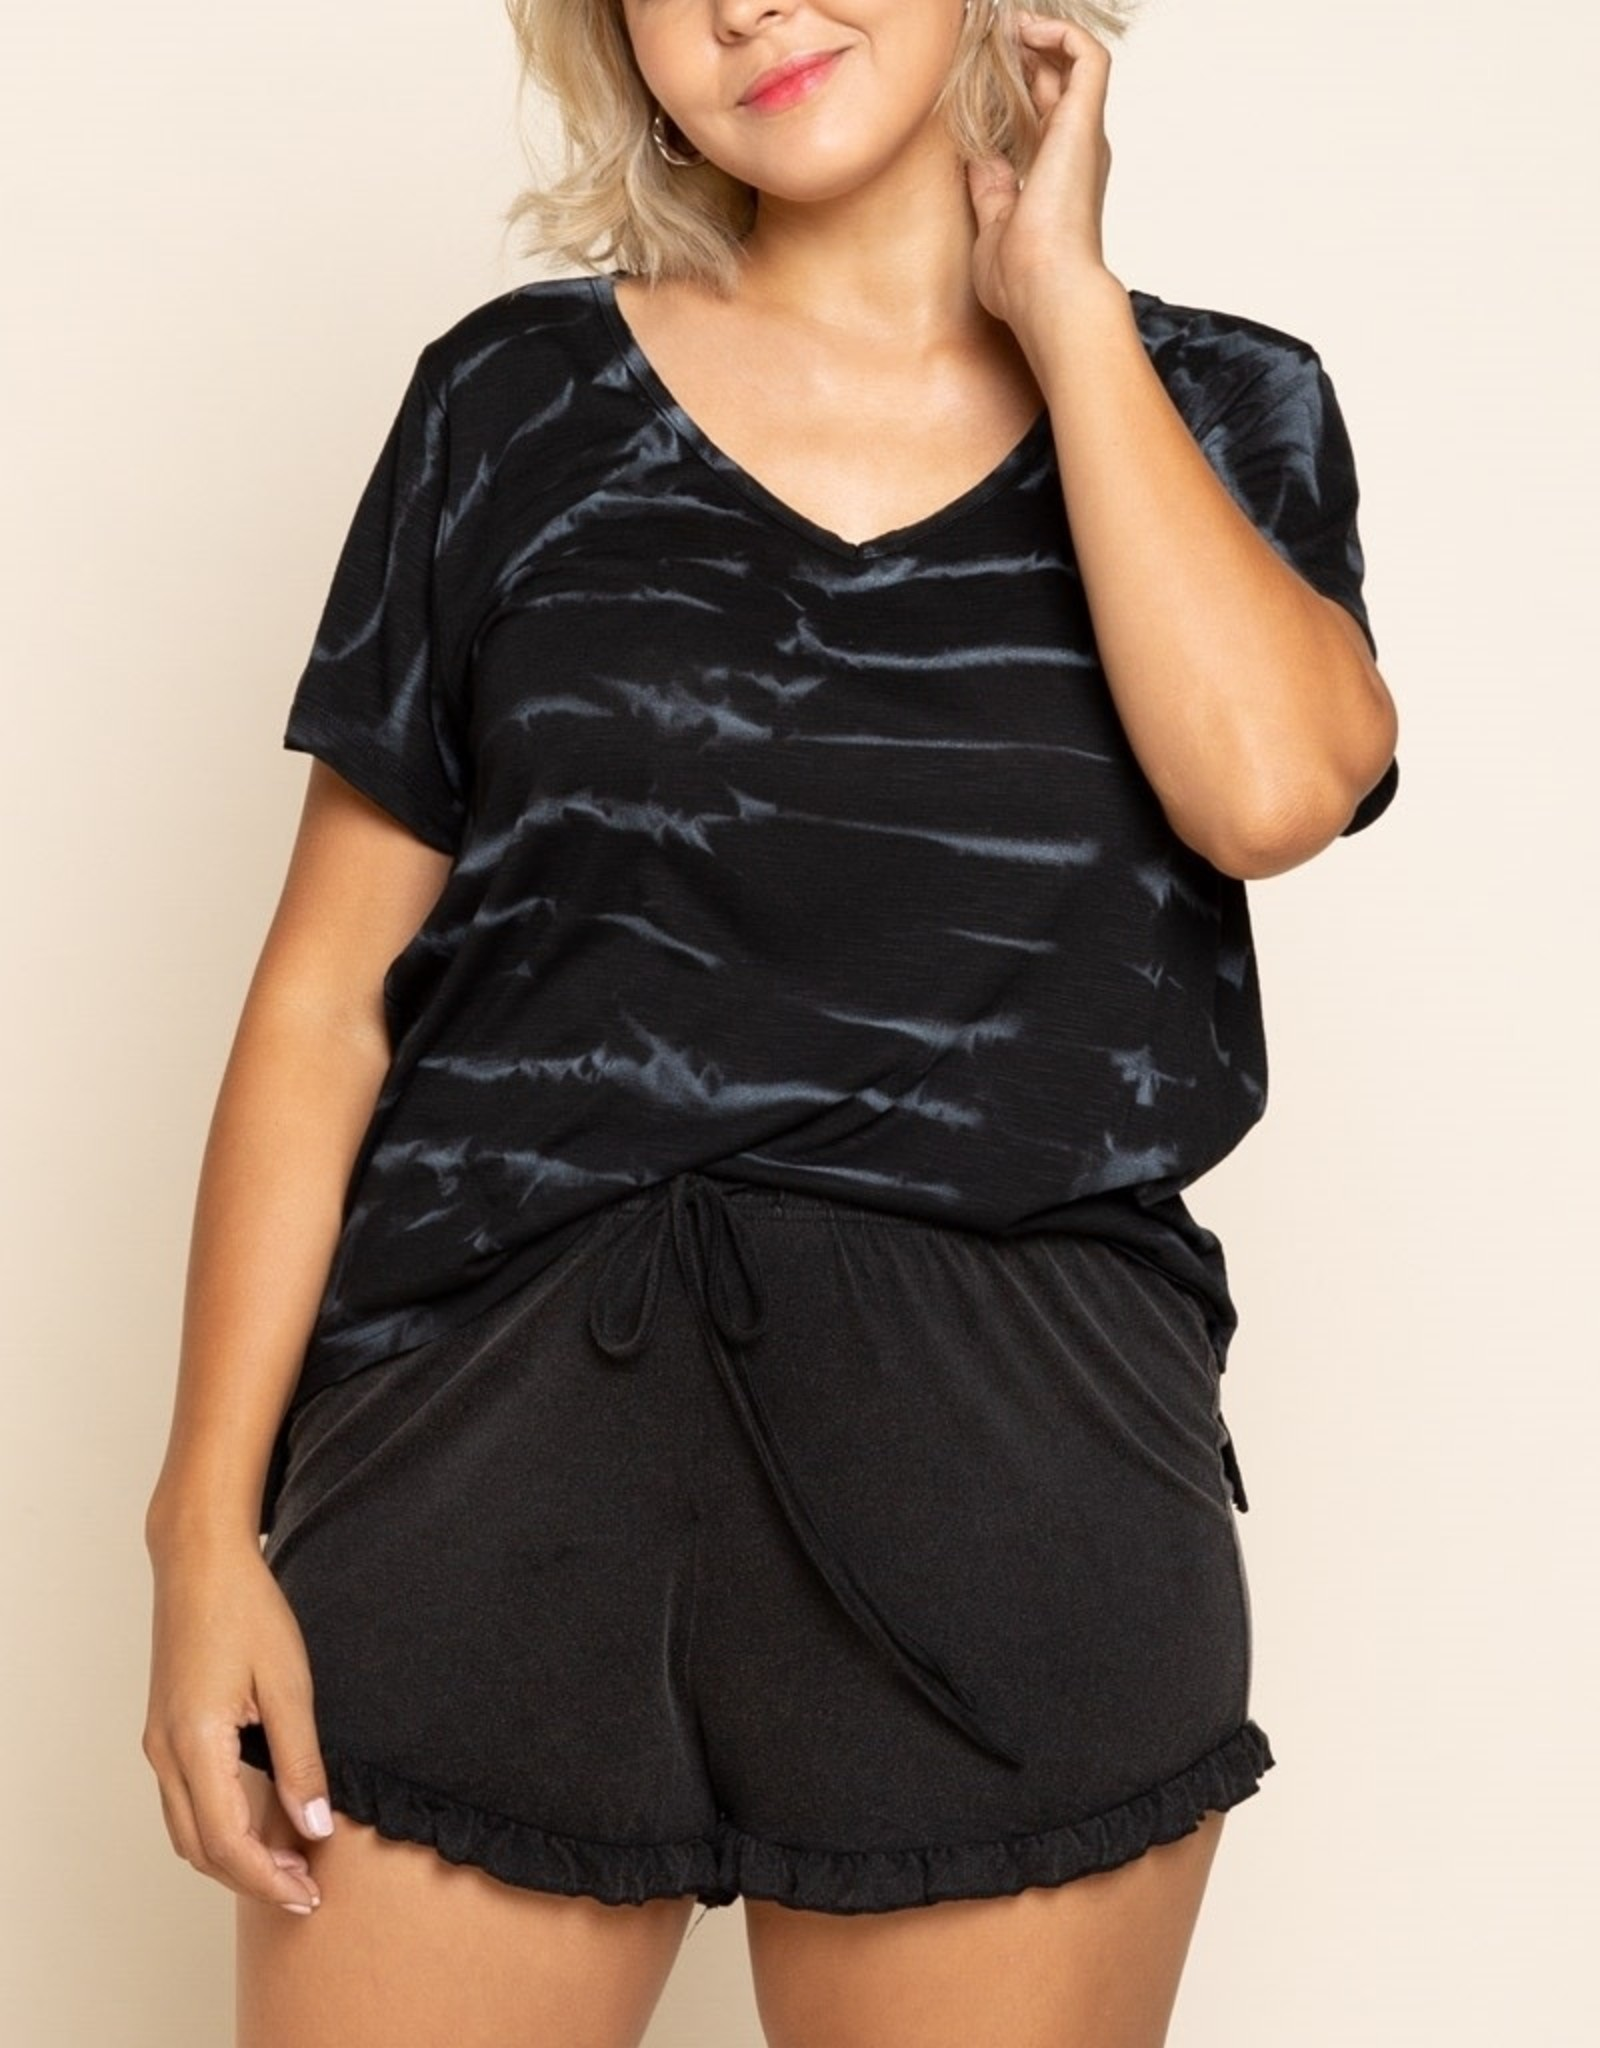 - Black/White Tie-Dye Short Sleeve Top